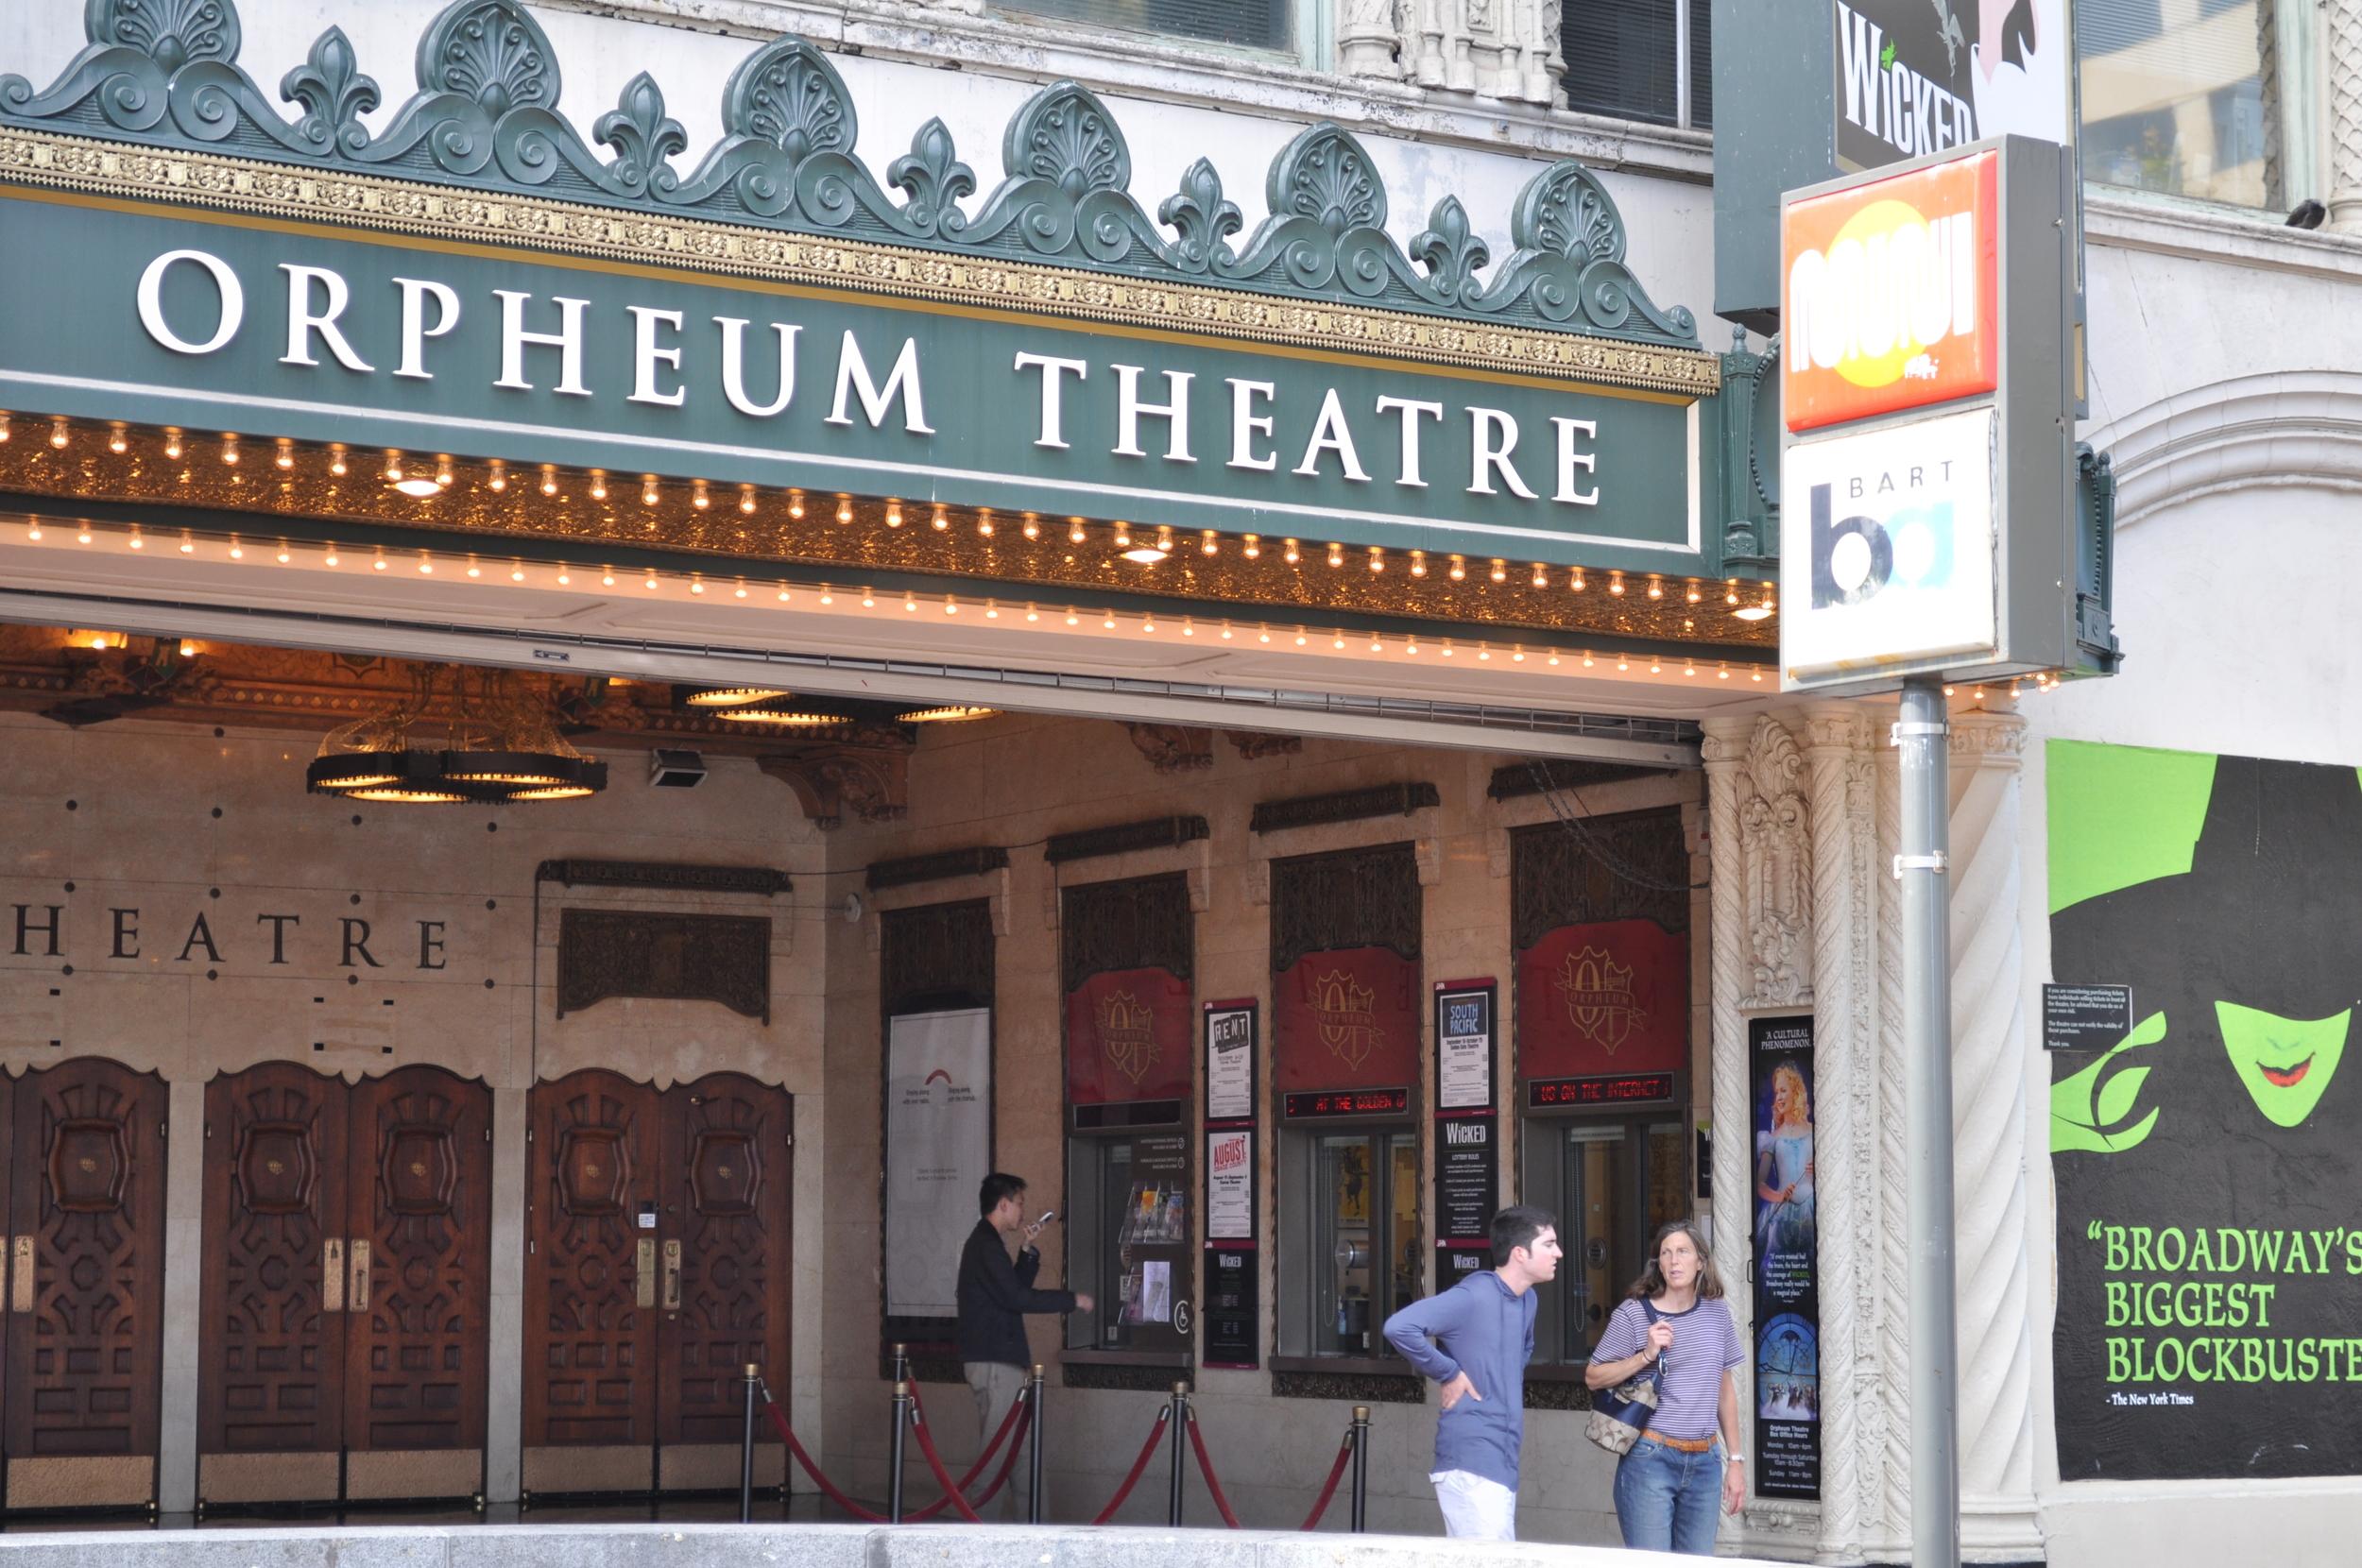 San_Francisco_Orpheum_Theatre_box_office.jpg